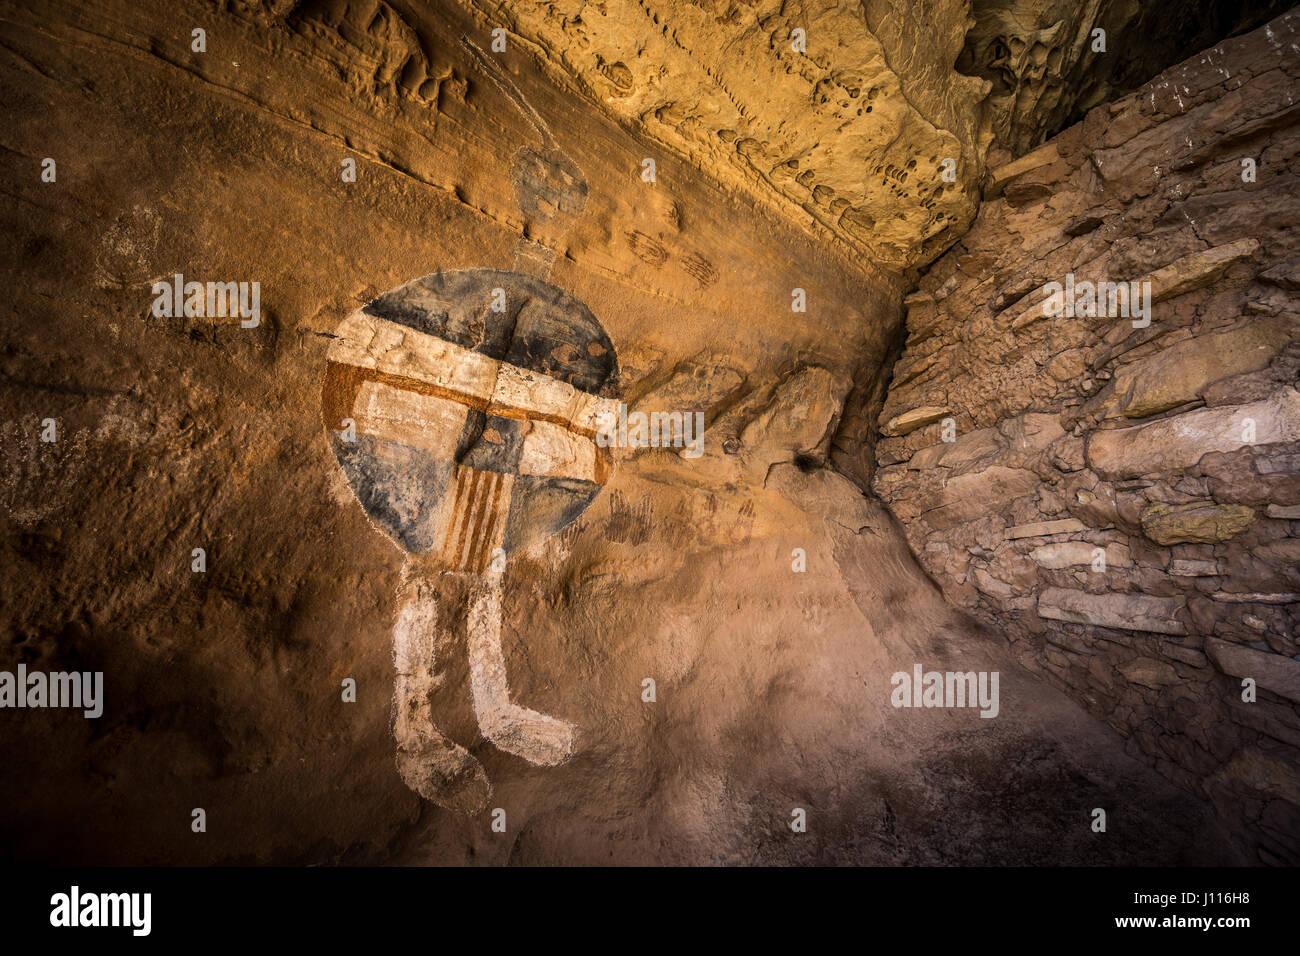 All American Man pictograph, Salt Creek, Canyonlands National Park, Utah. - Stock Image